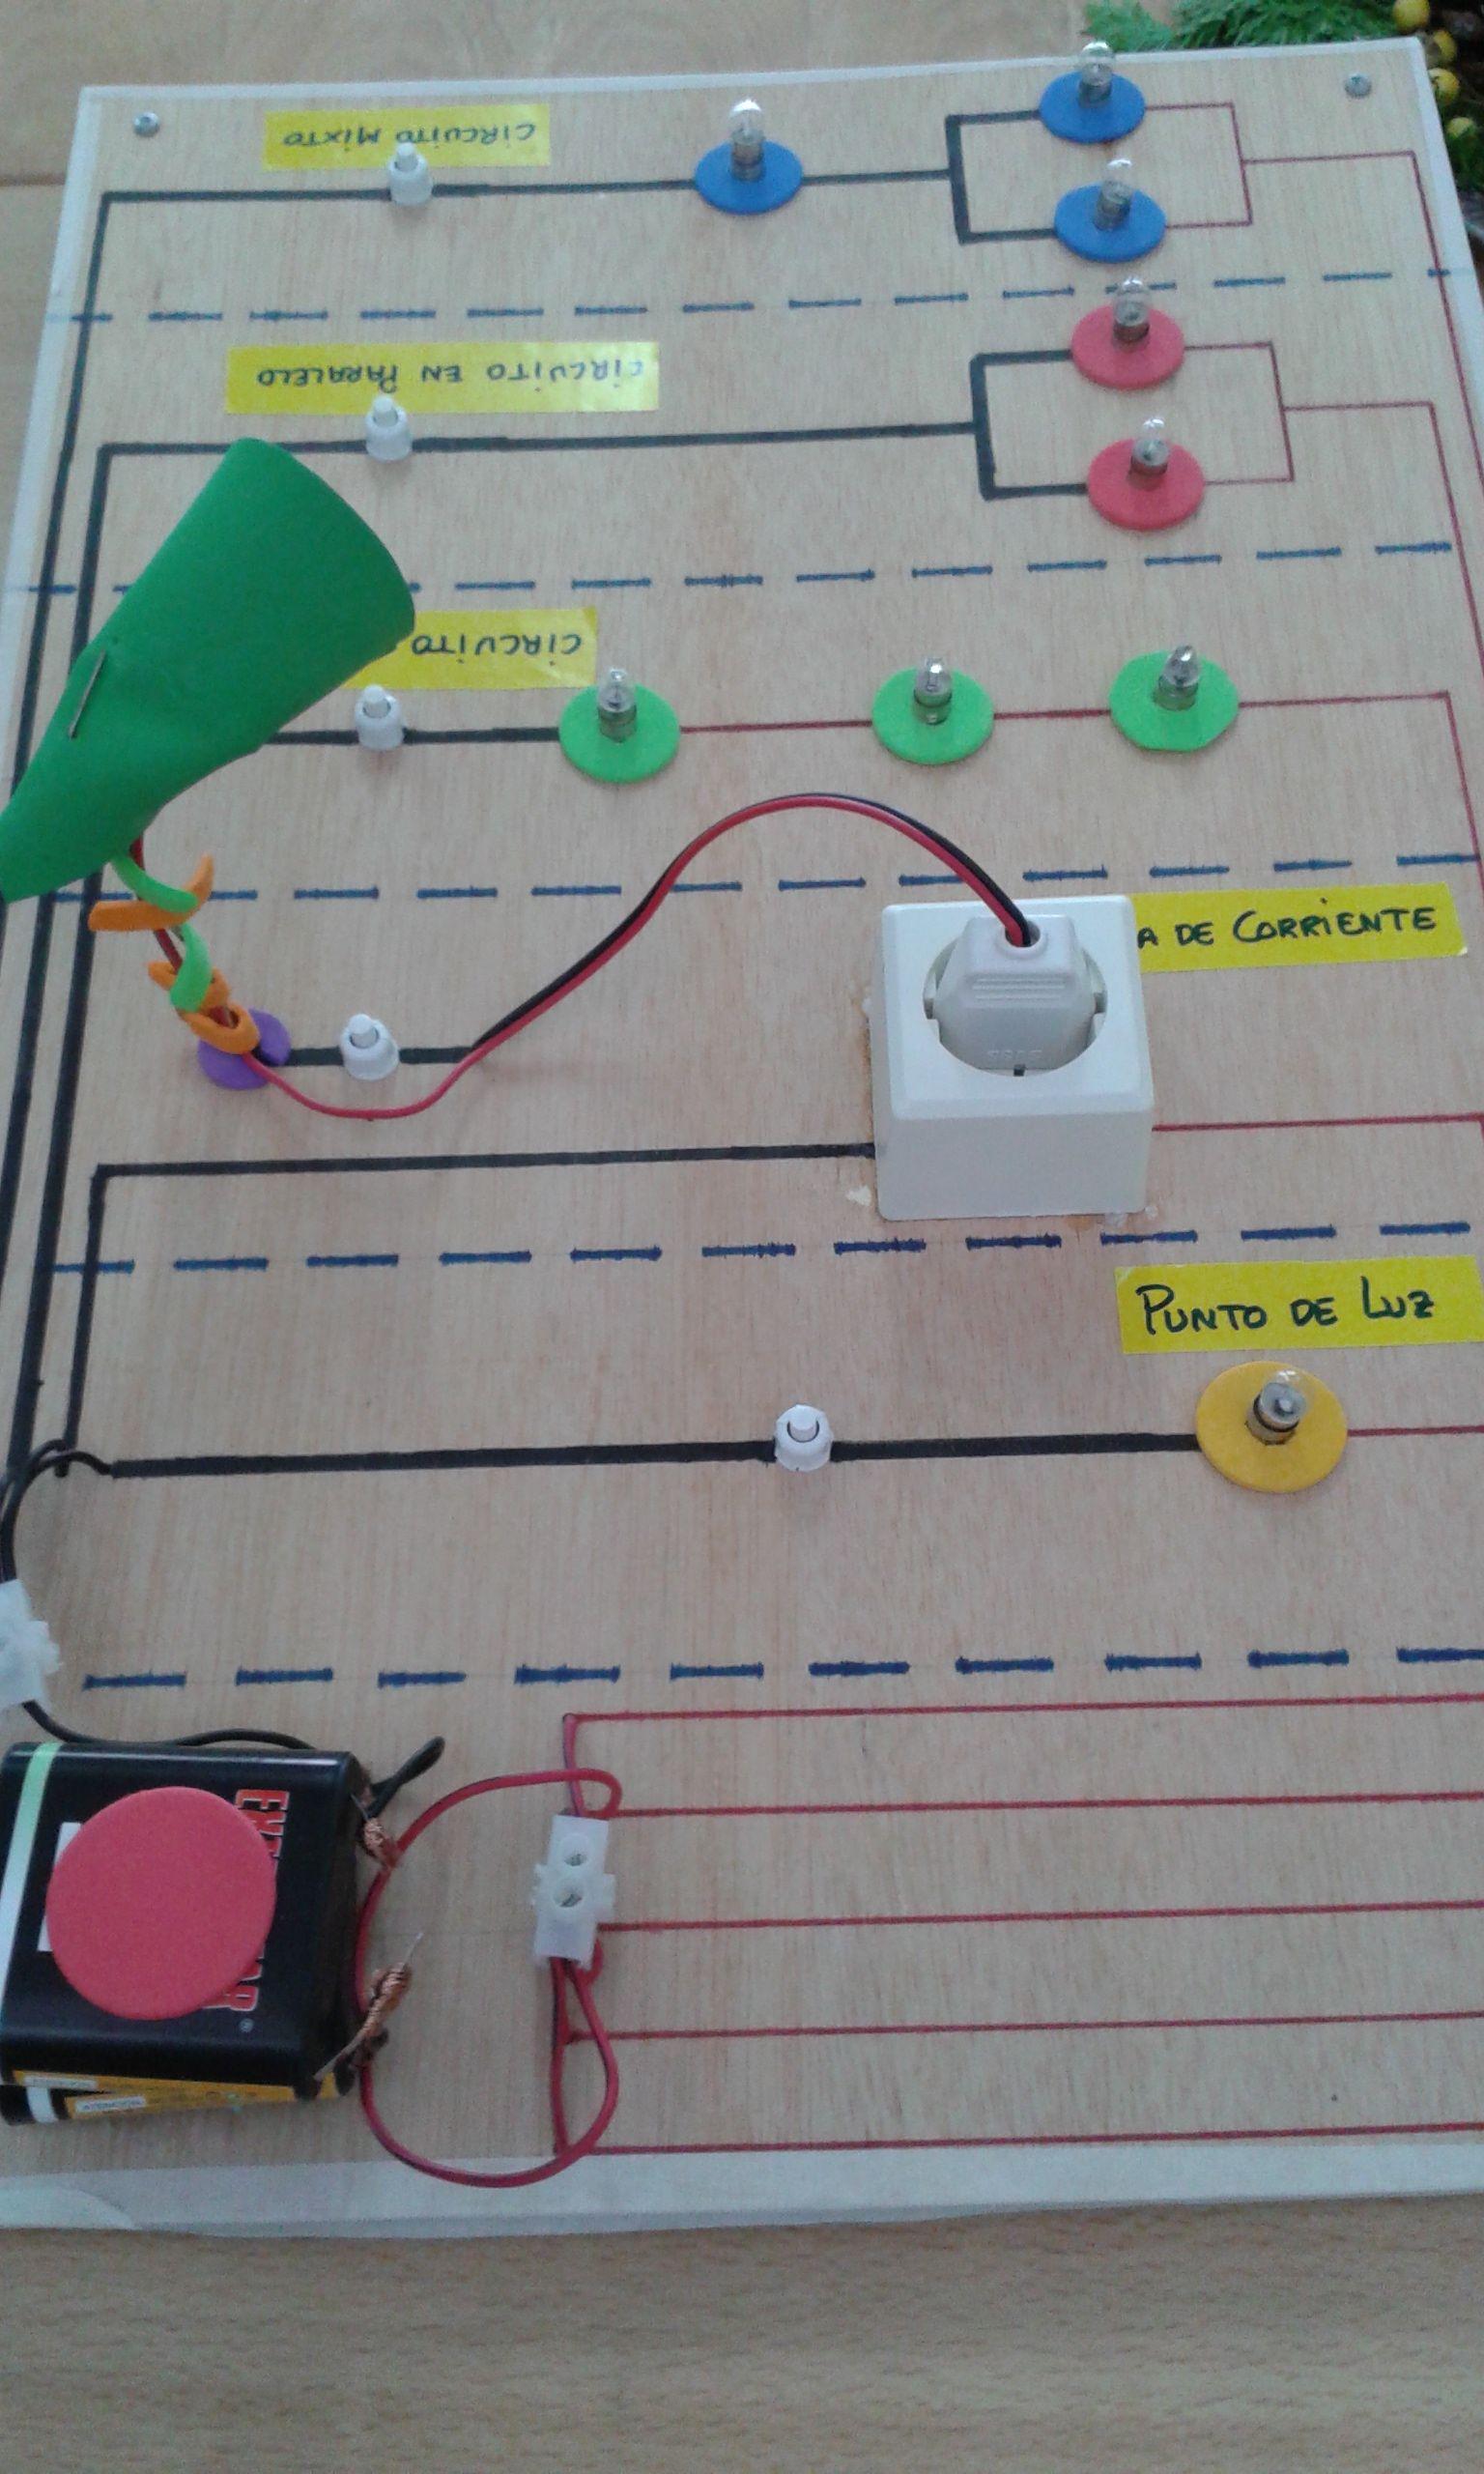 Circuito Seri E Paralelo : Simulador de circuitos eléctricos básicos en serie paralelo y